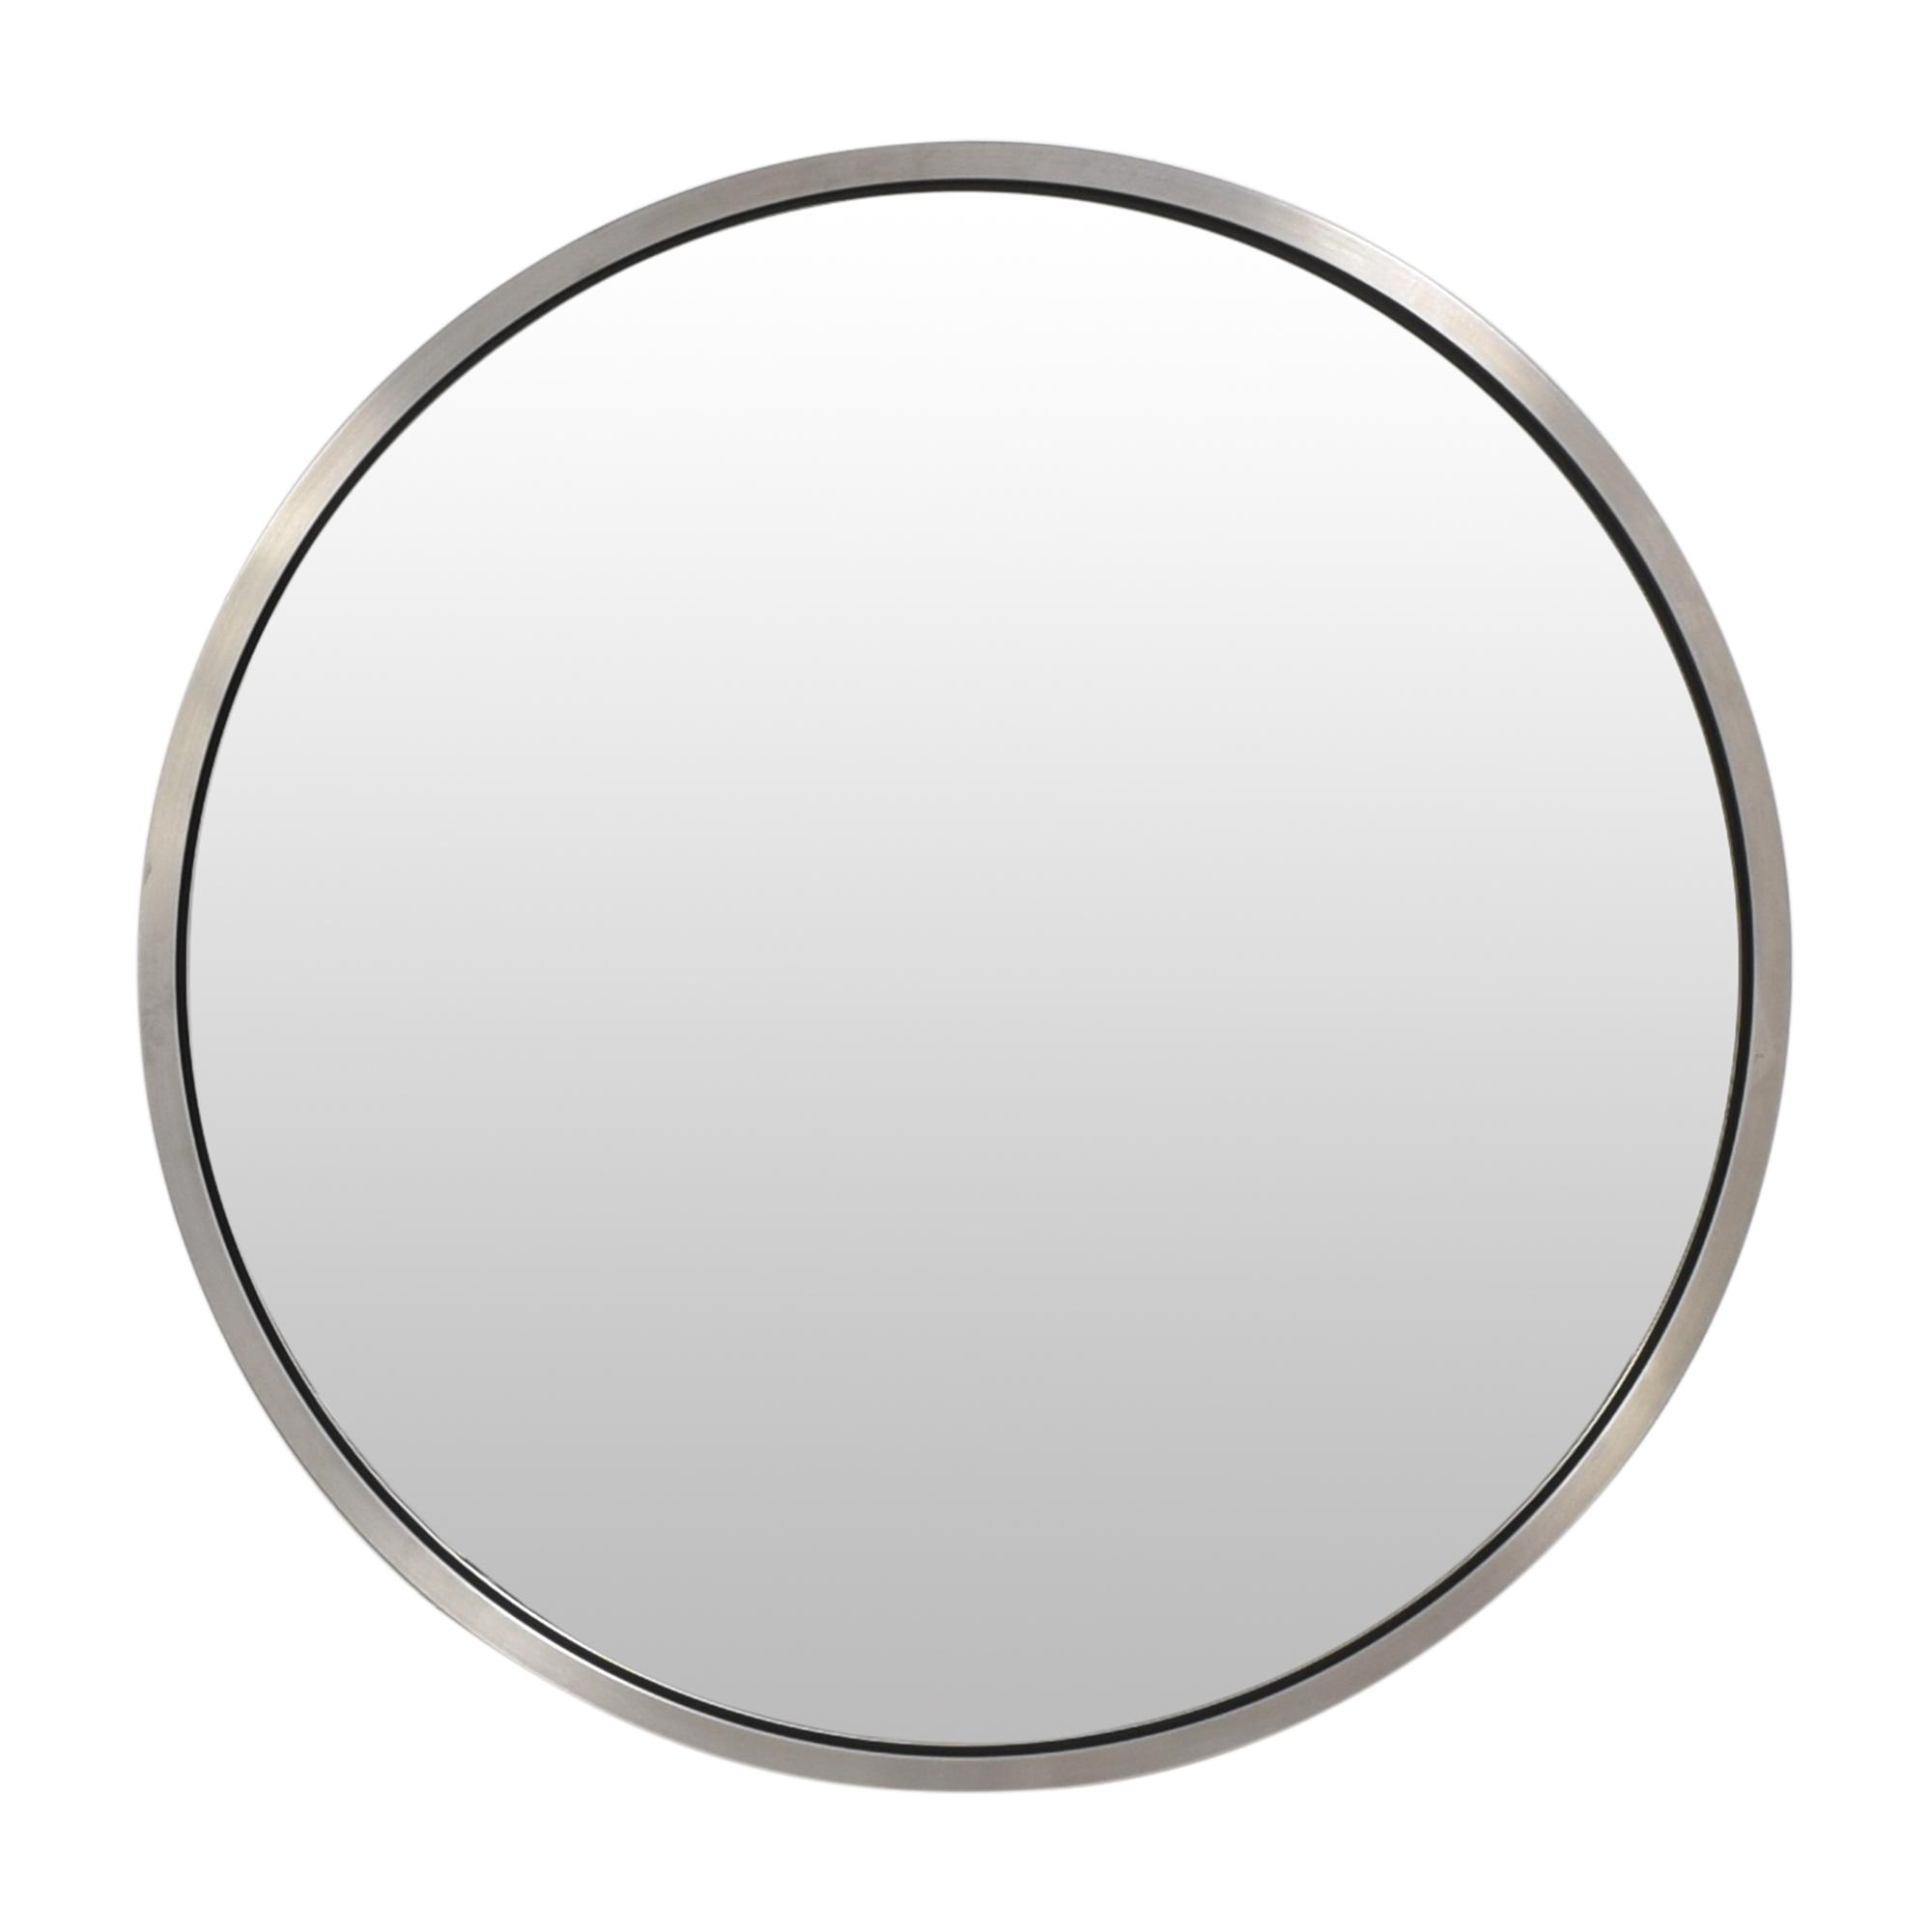 Ethan Allen Ethan Allen Sphere Mirror ma